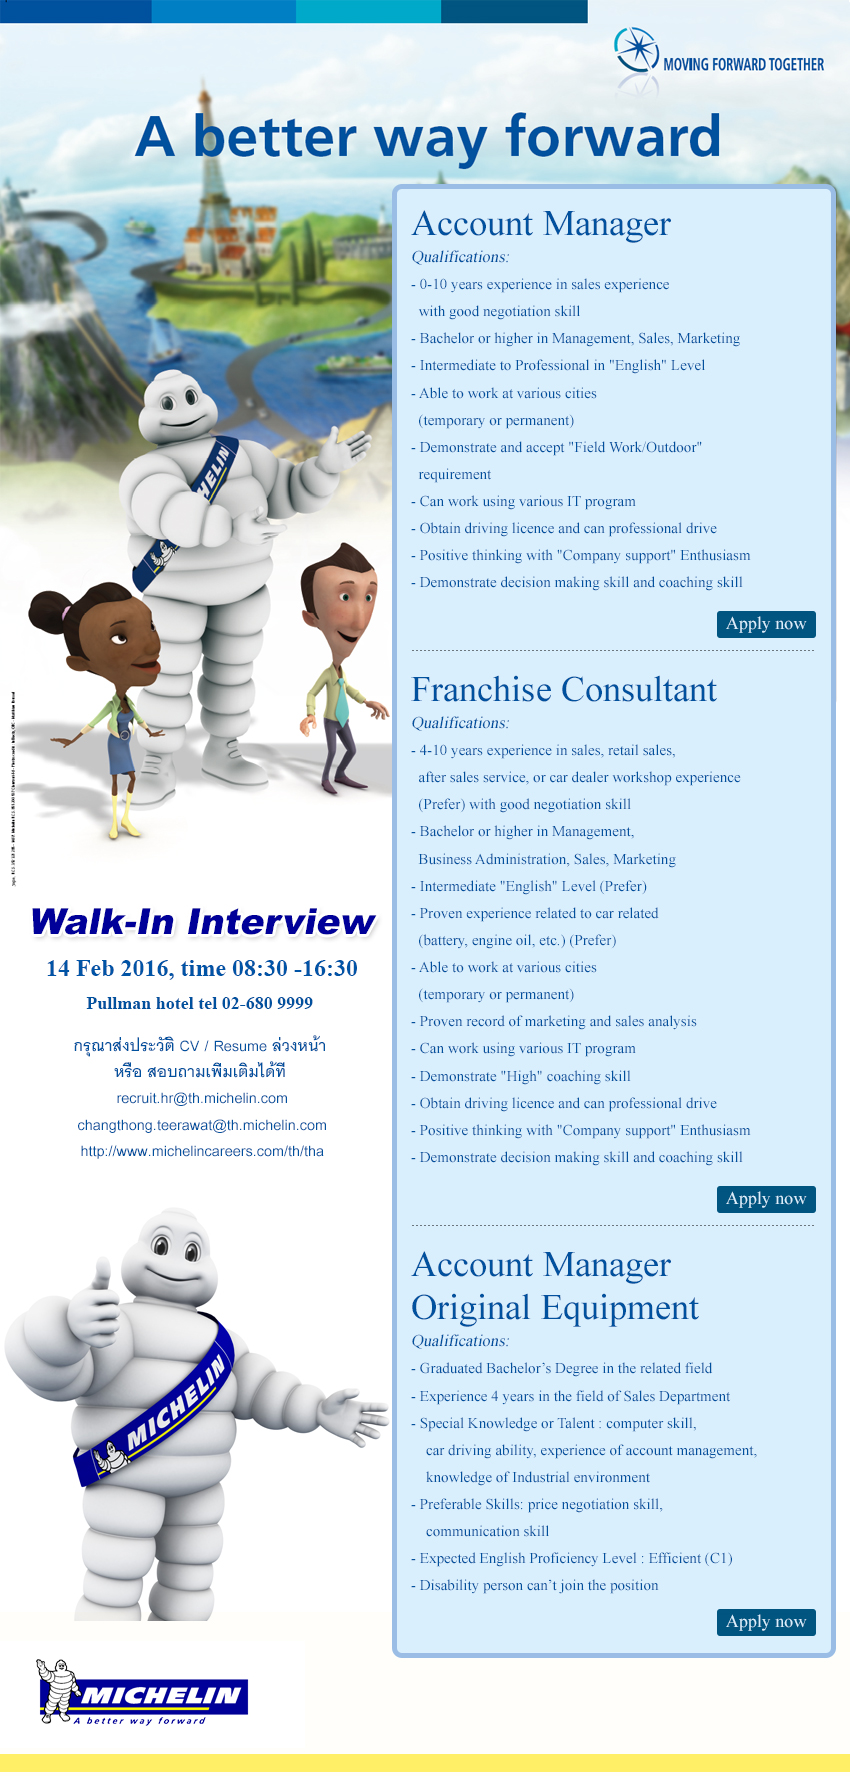 Michelin Walk-in Interview